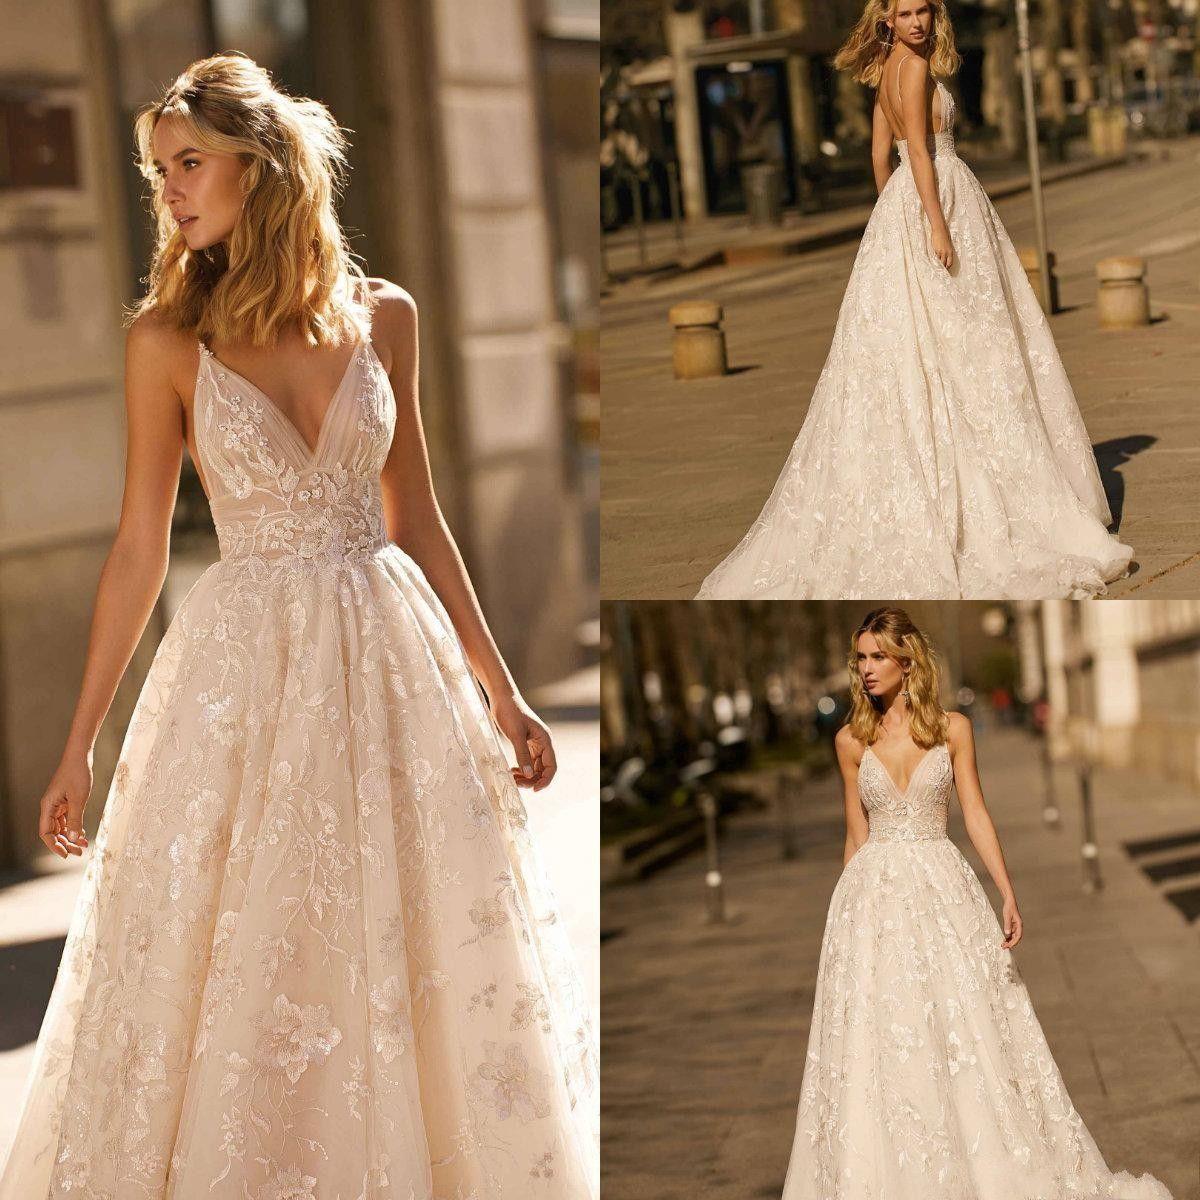 Berta 2021 Sexy Lace Wedding Dresses Appliqued A Line Sweep Train Spaghetti Beach Wedding Gowns Custom Made Sexy Sequins Boho Bridal Dress